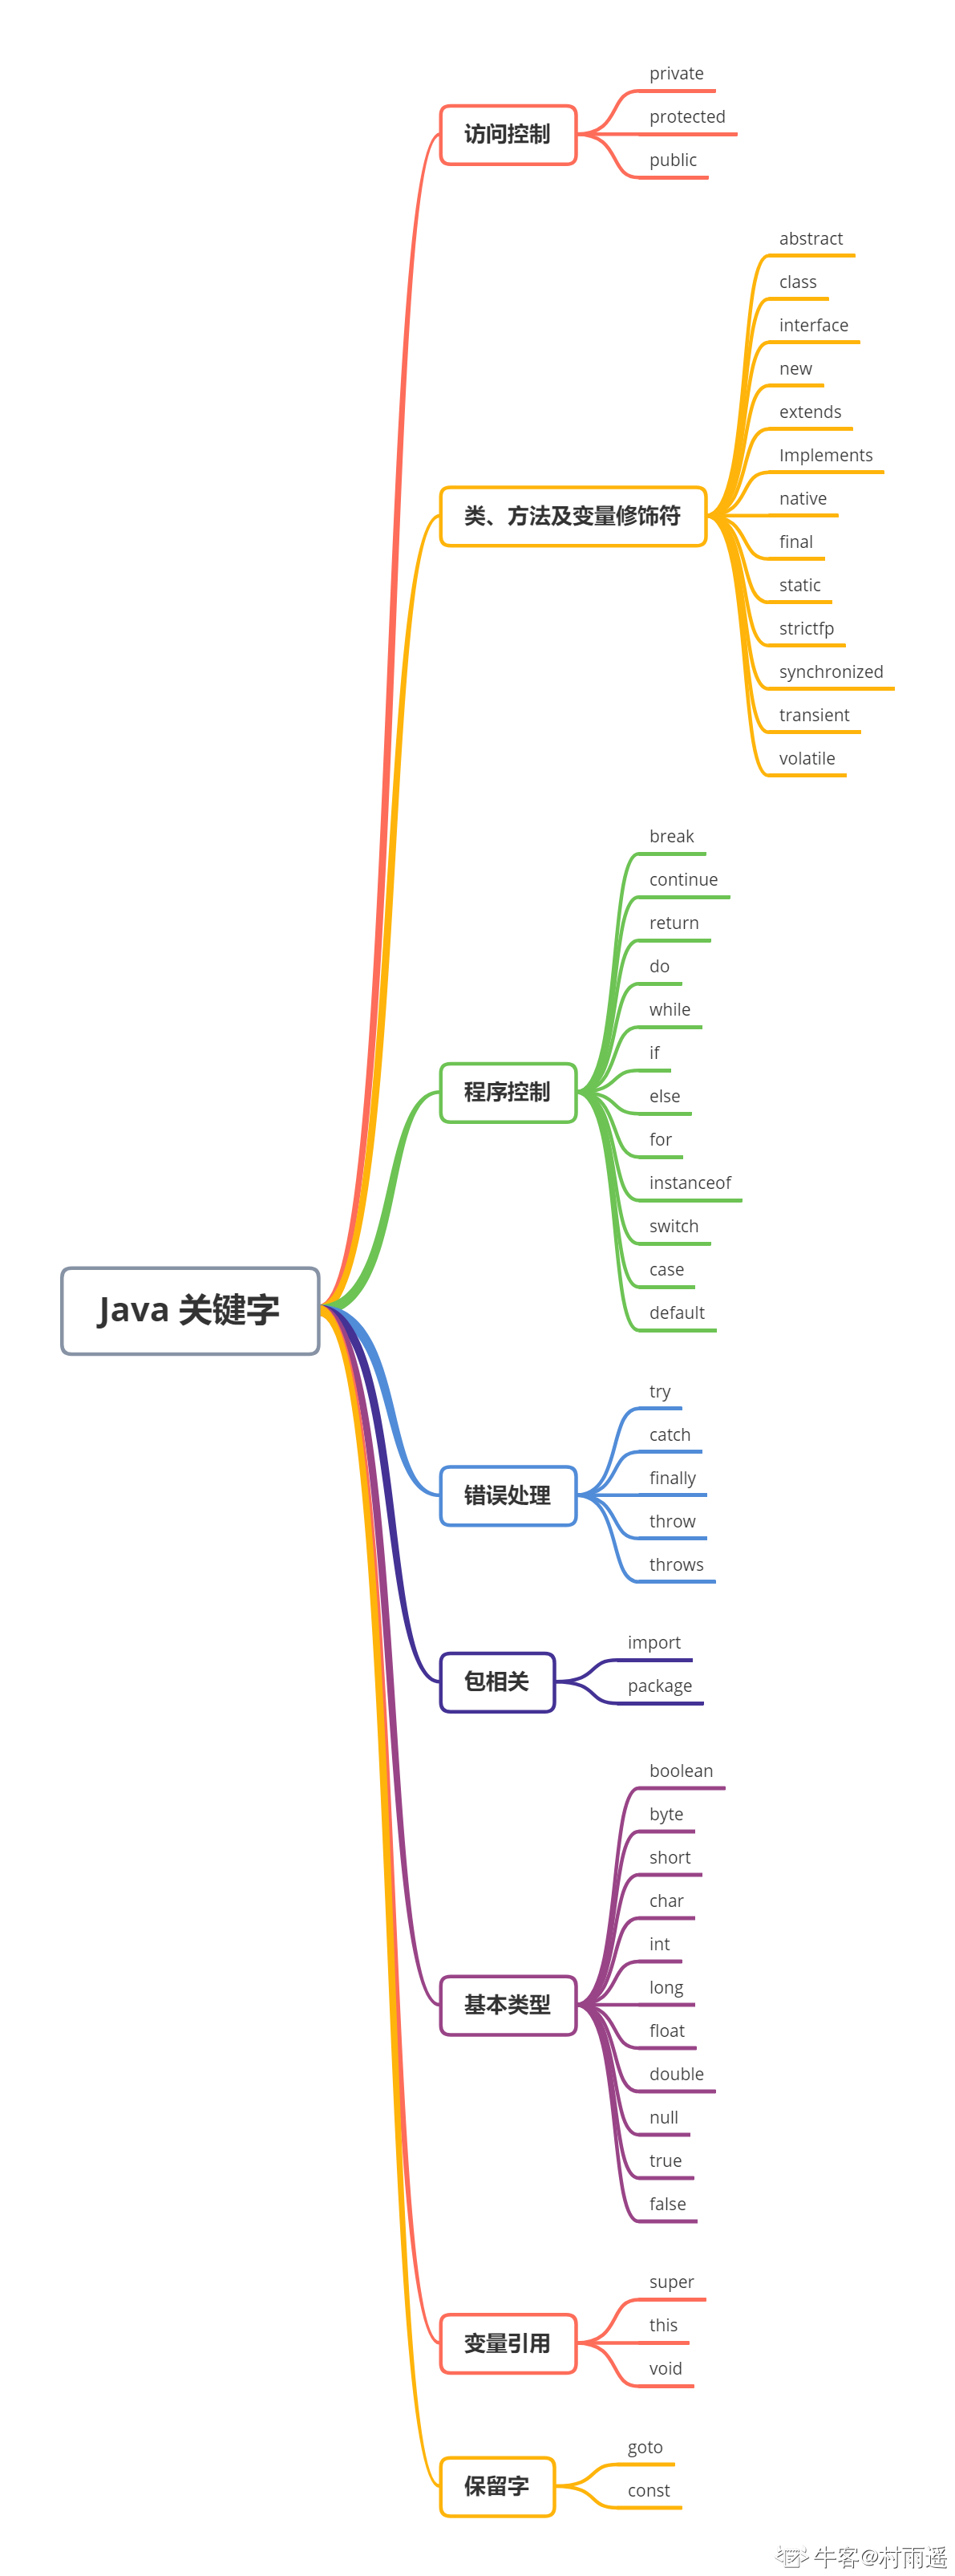 Java 关键字